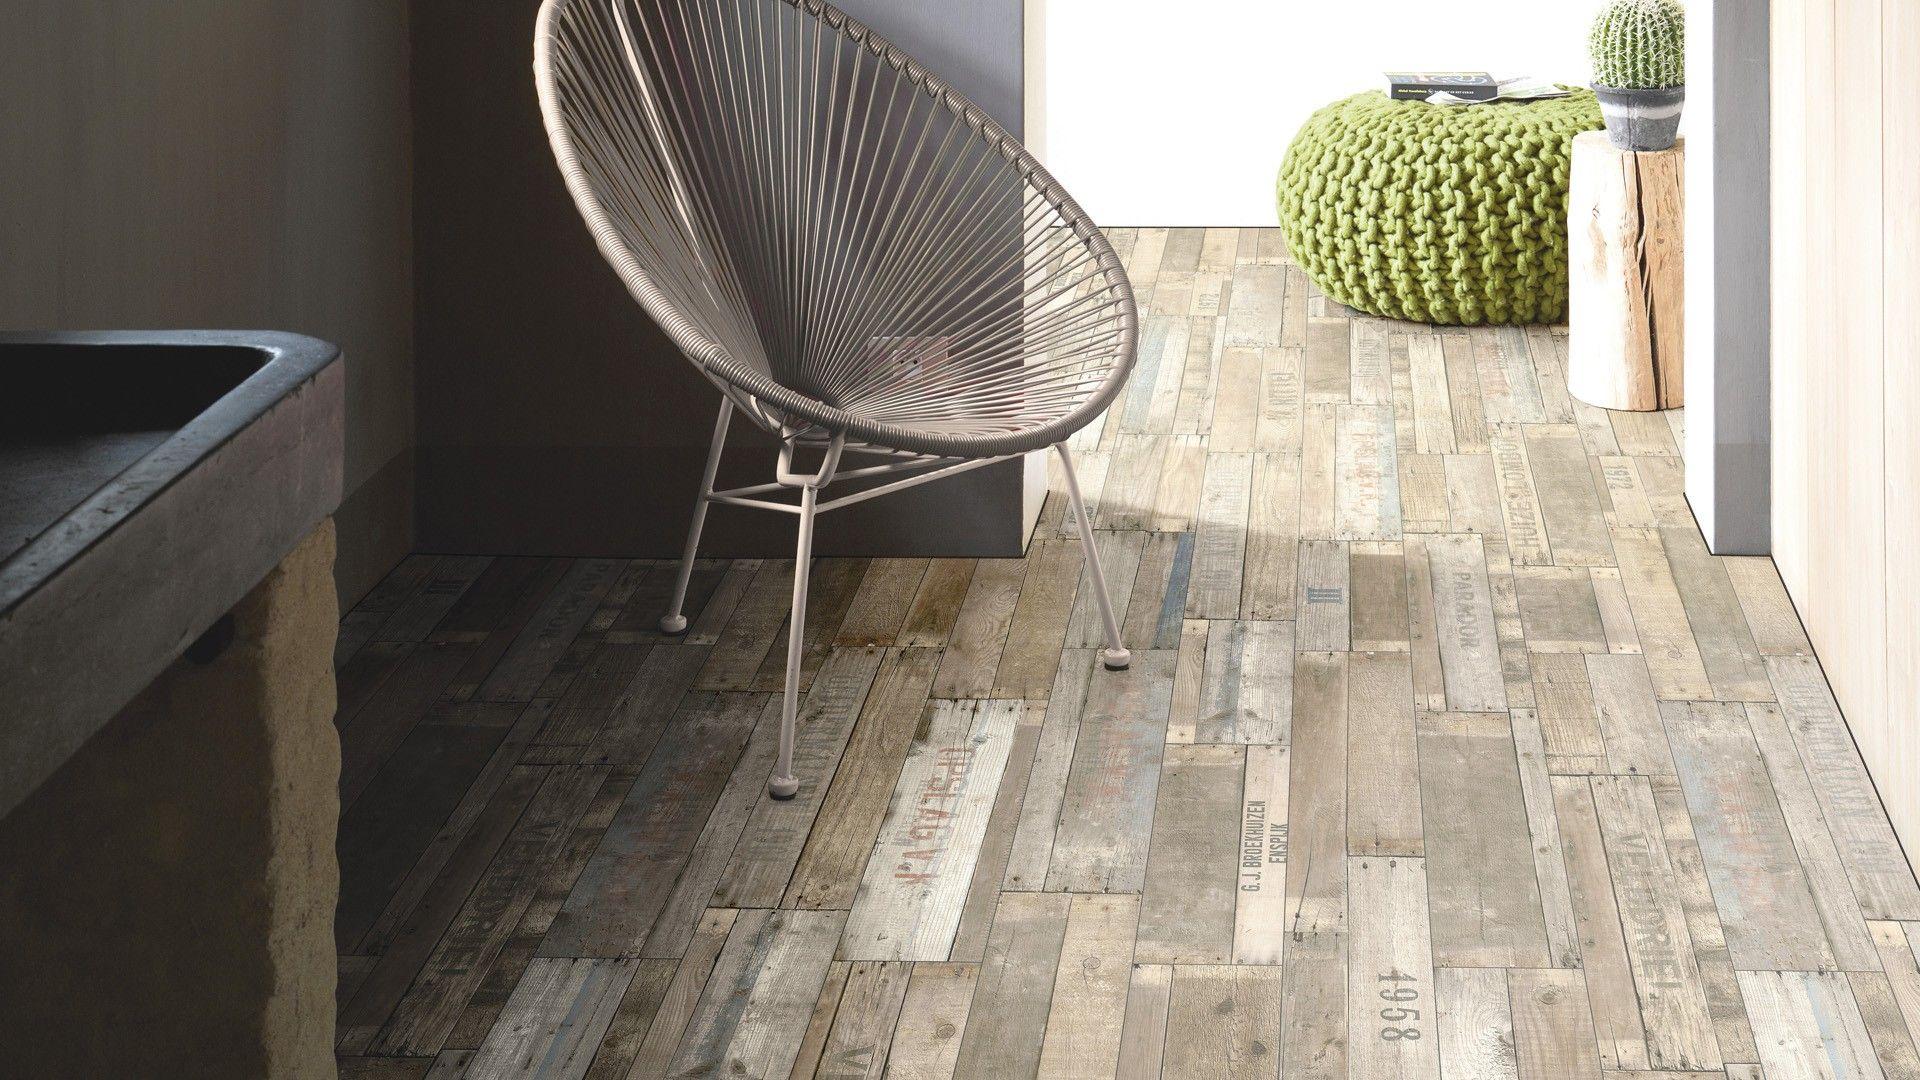 sol stratifi trendtime1 globetrotter saint maclou deco d int rieur pinterest. Black Bedroom Furniture Sets. Home Design Ideas